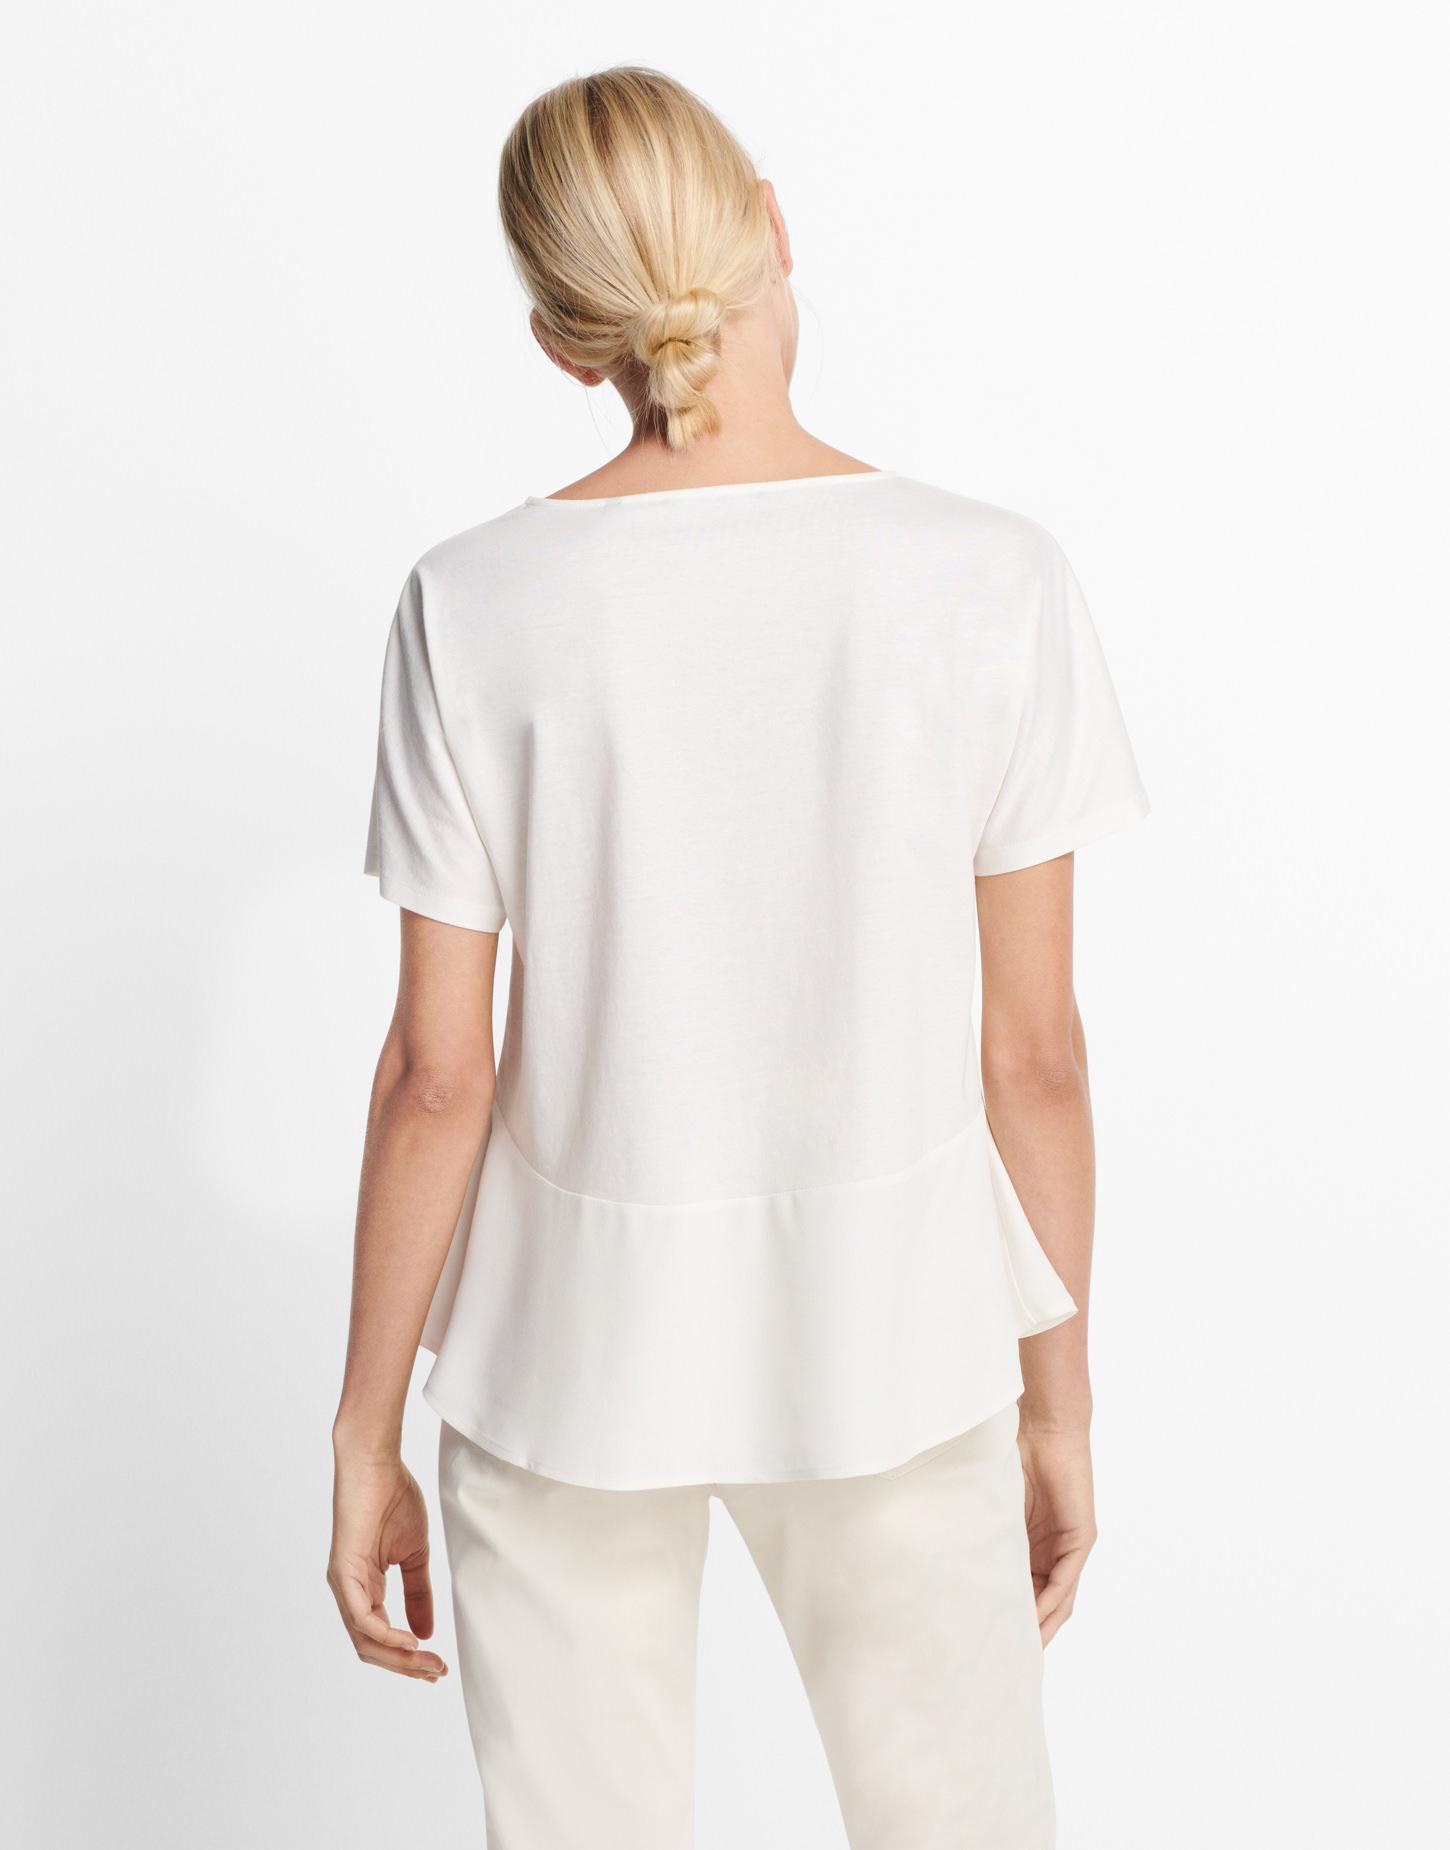 Shirt Kevati someday hY3R5